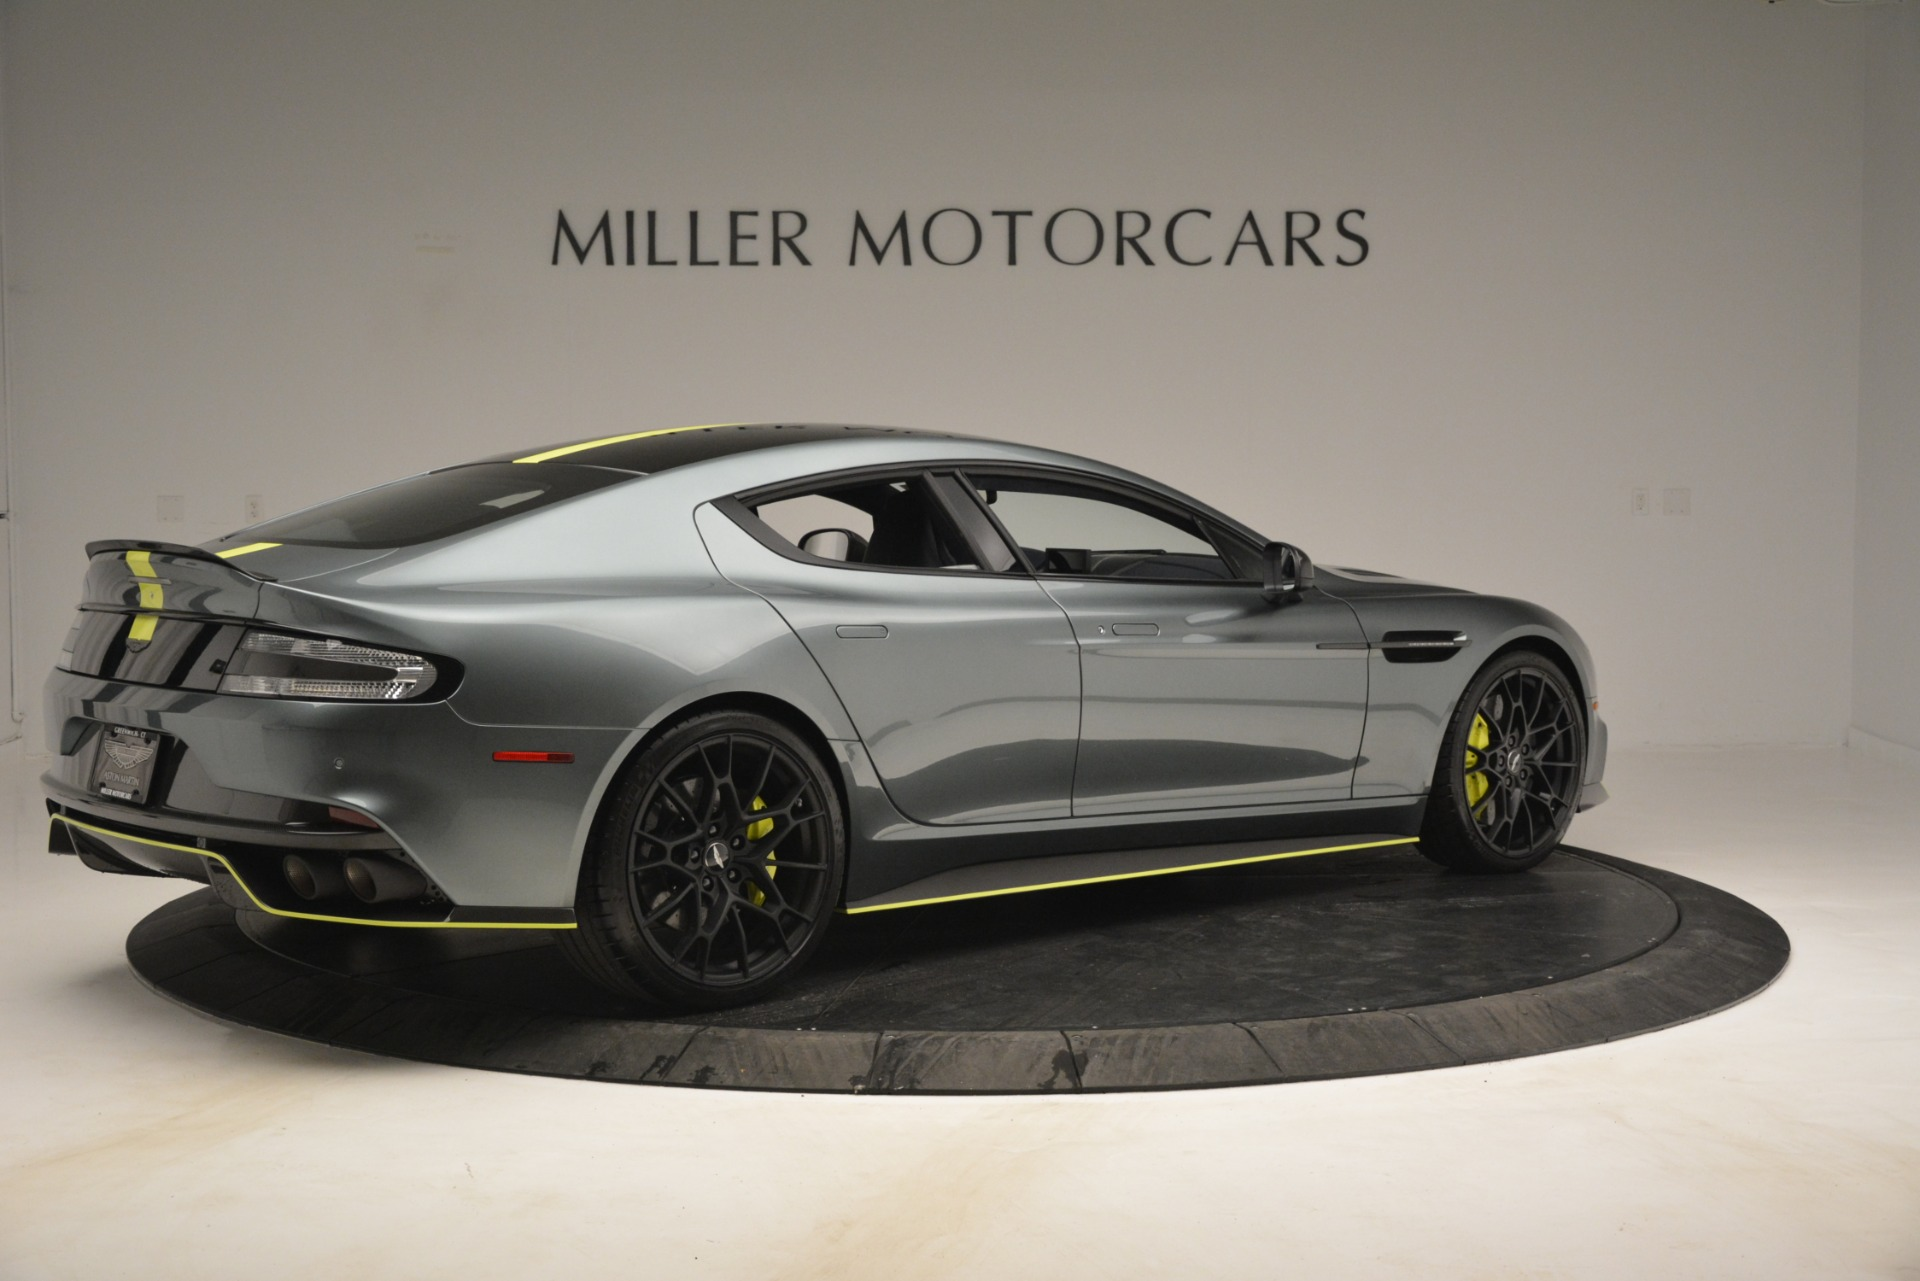 New 2019 Aston Martin Rapide AMR Sedan For Sale In Westport, CT 2975_p8